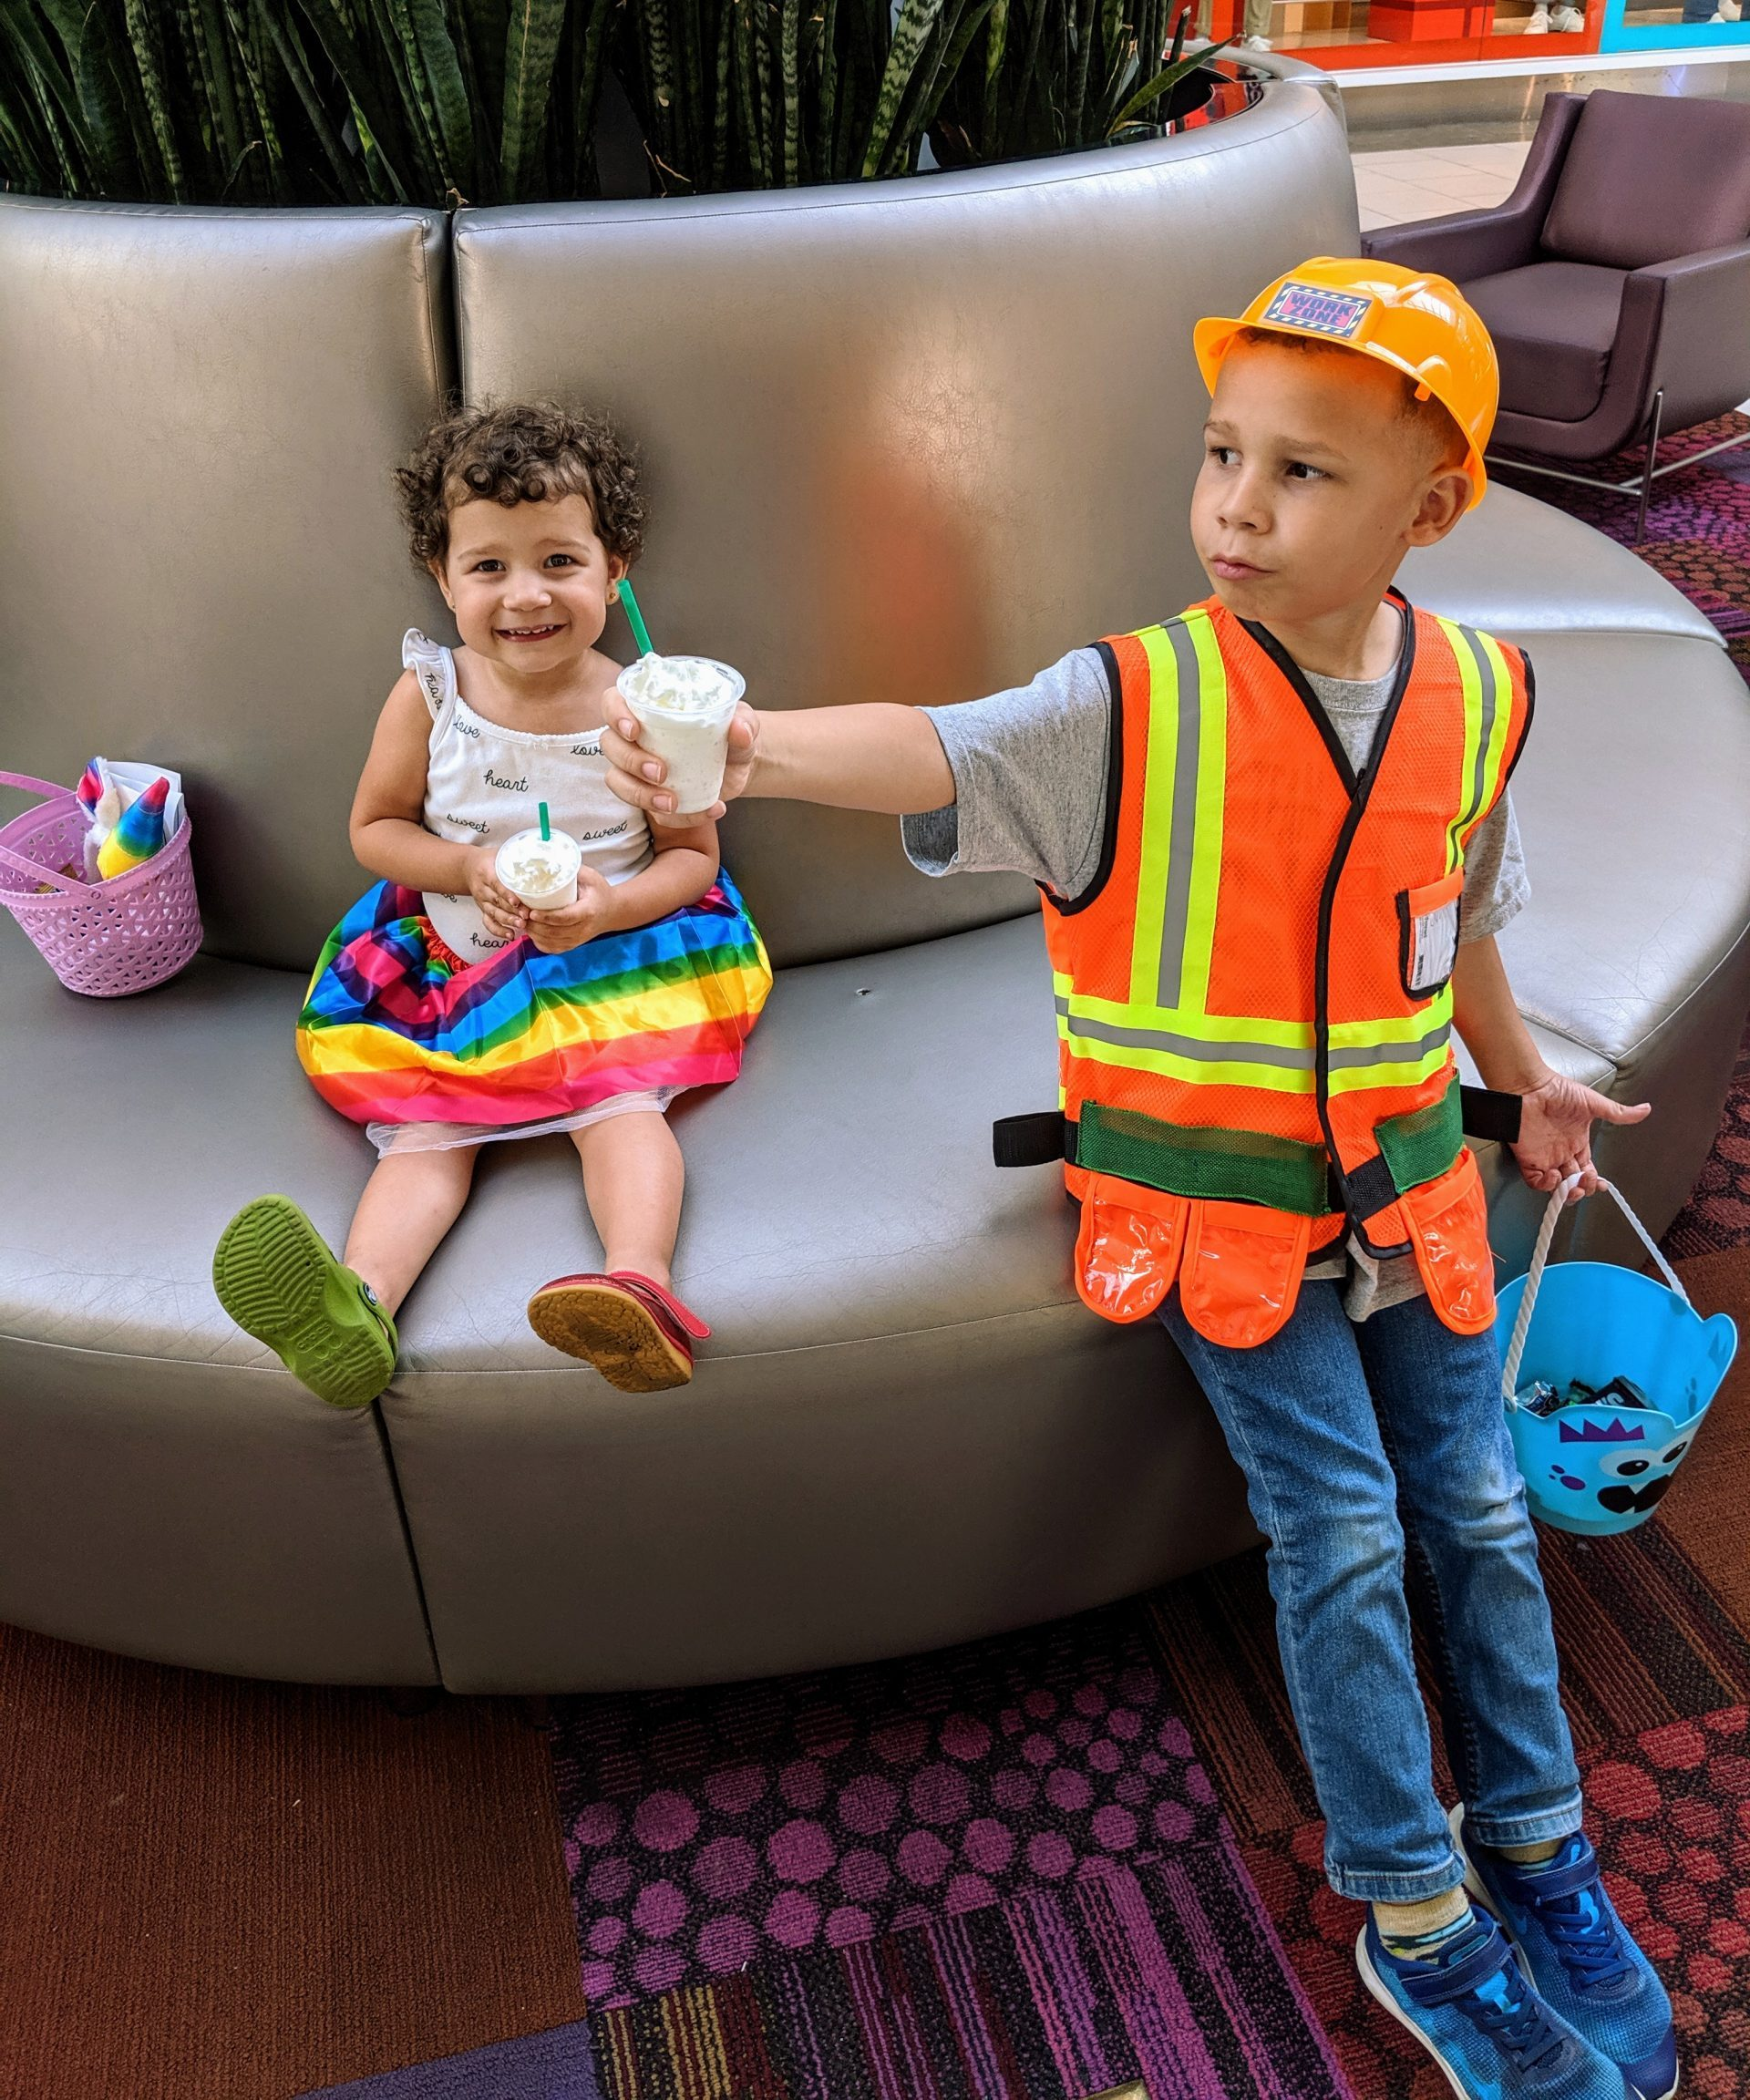 Halloween Candy: How to Enjoy It in Moderation   Dr. Bob Pediatric Dentist Lynda Lantz Contributor Miami Mom Collective